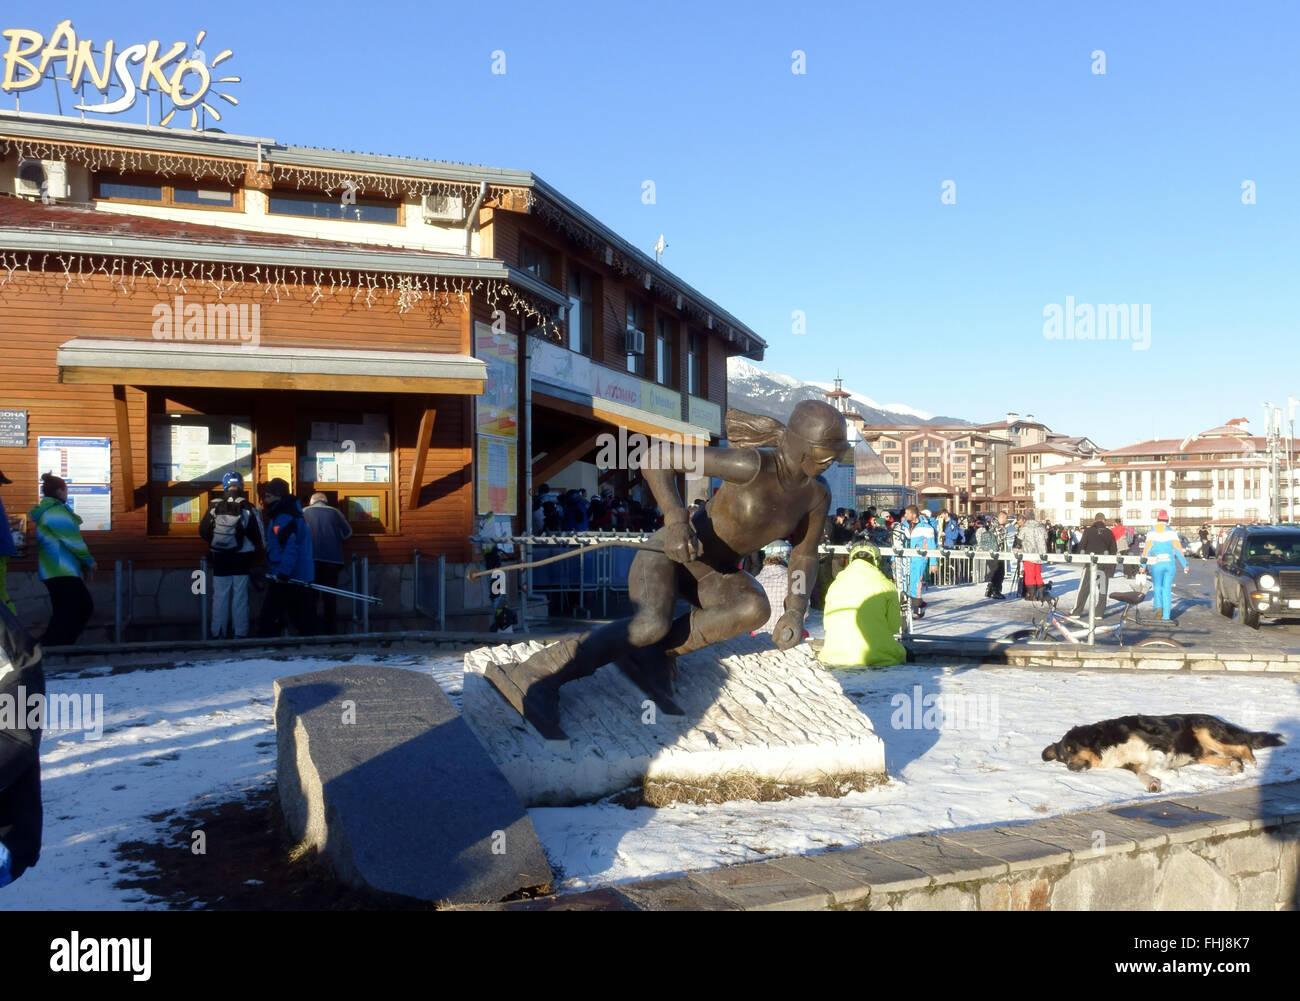 Early morning at the bottom of the Bansko ski lift Bulgaria - Stock Image